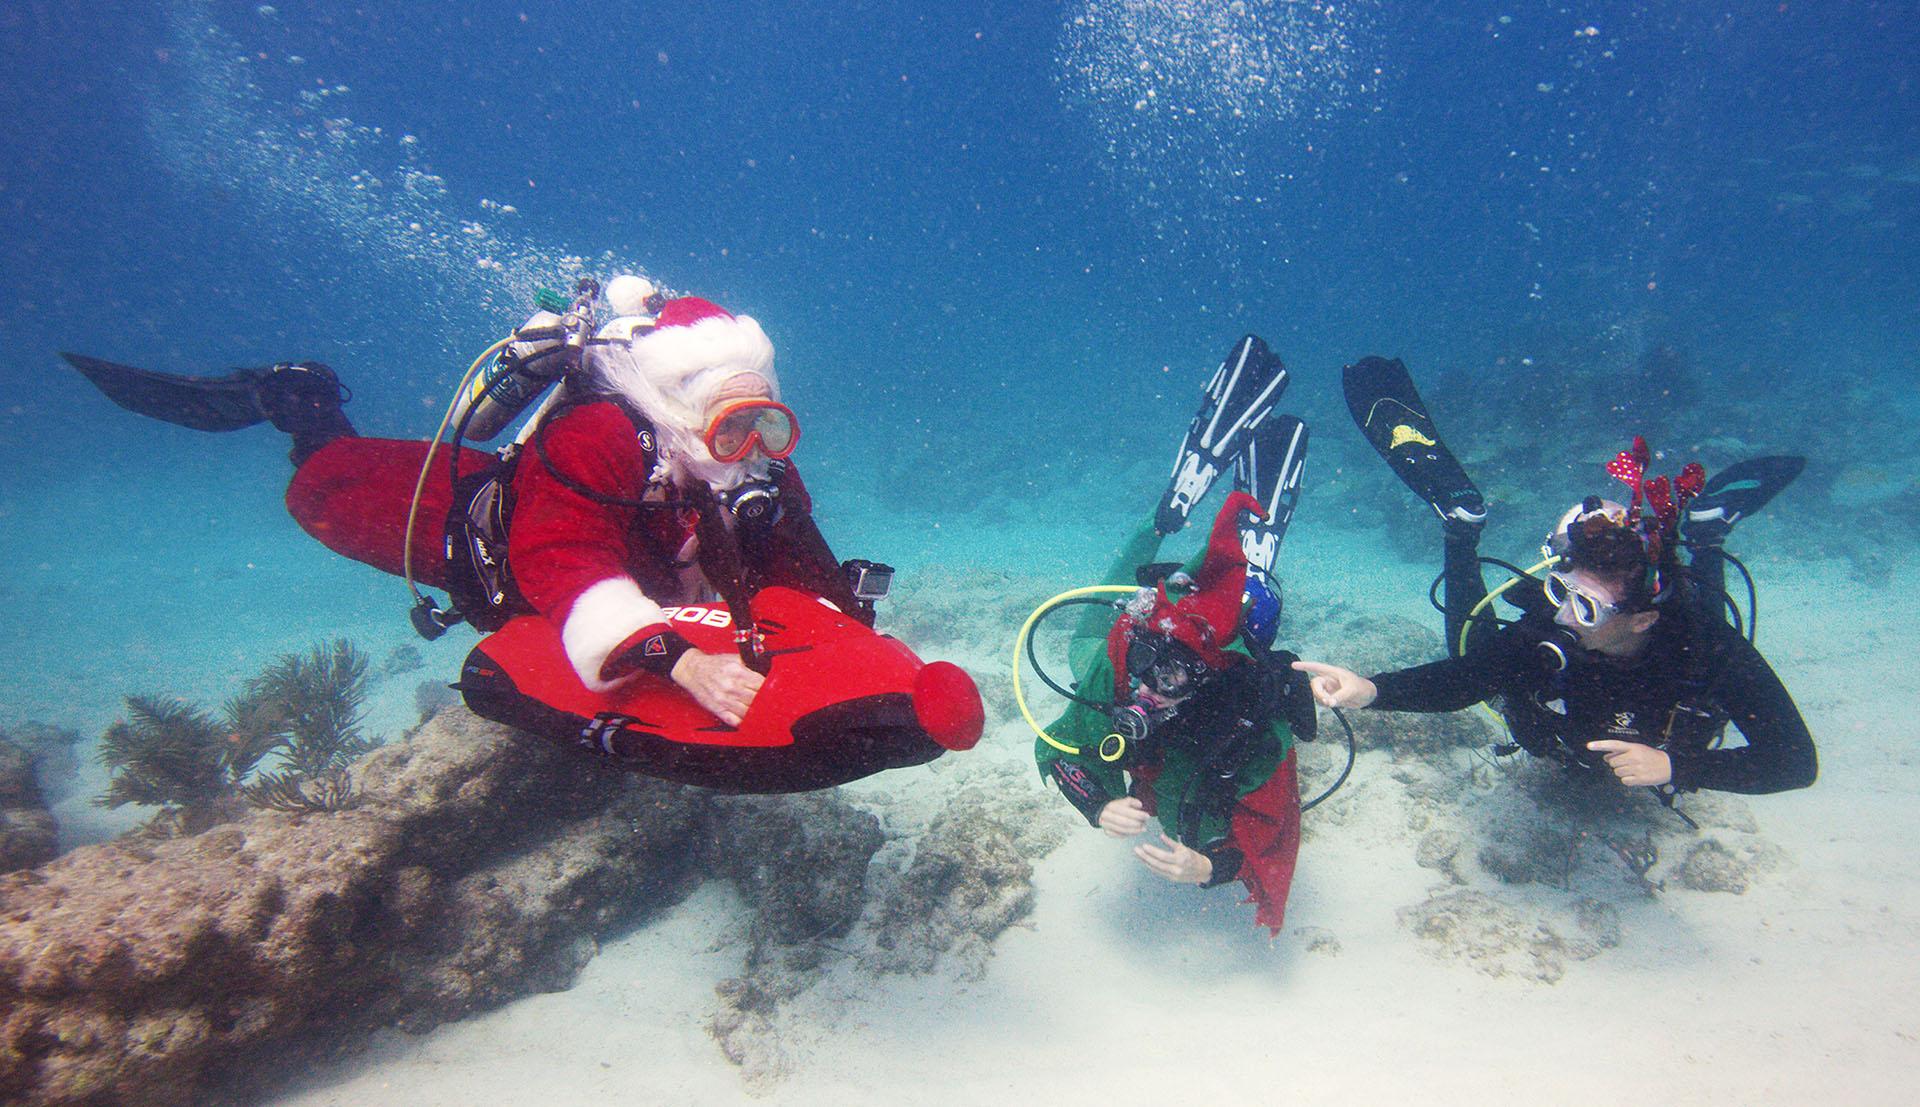 En Florida bucean vestidos de Papá Noel (Photo by Frazier Nivens / Florida Keys News Bureau / AFP)